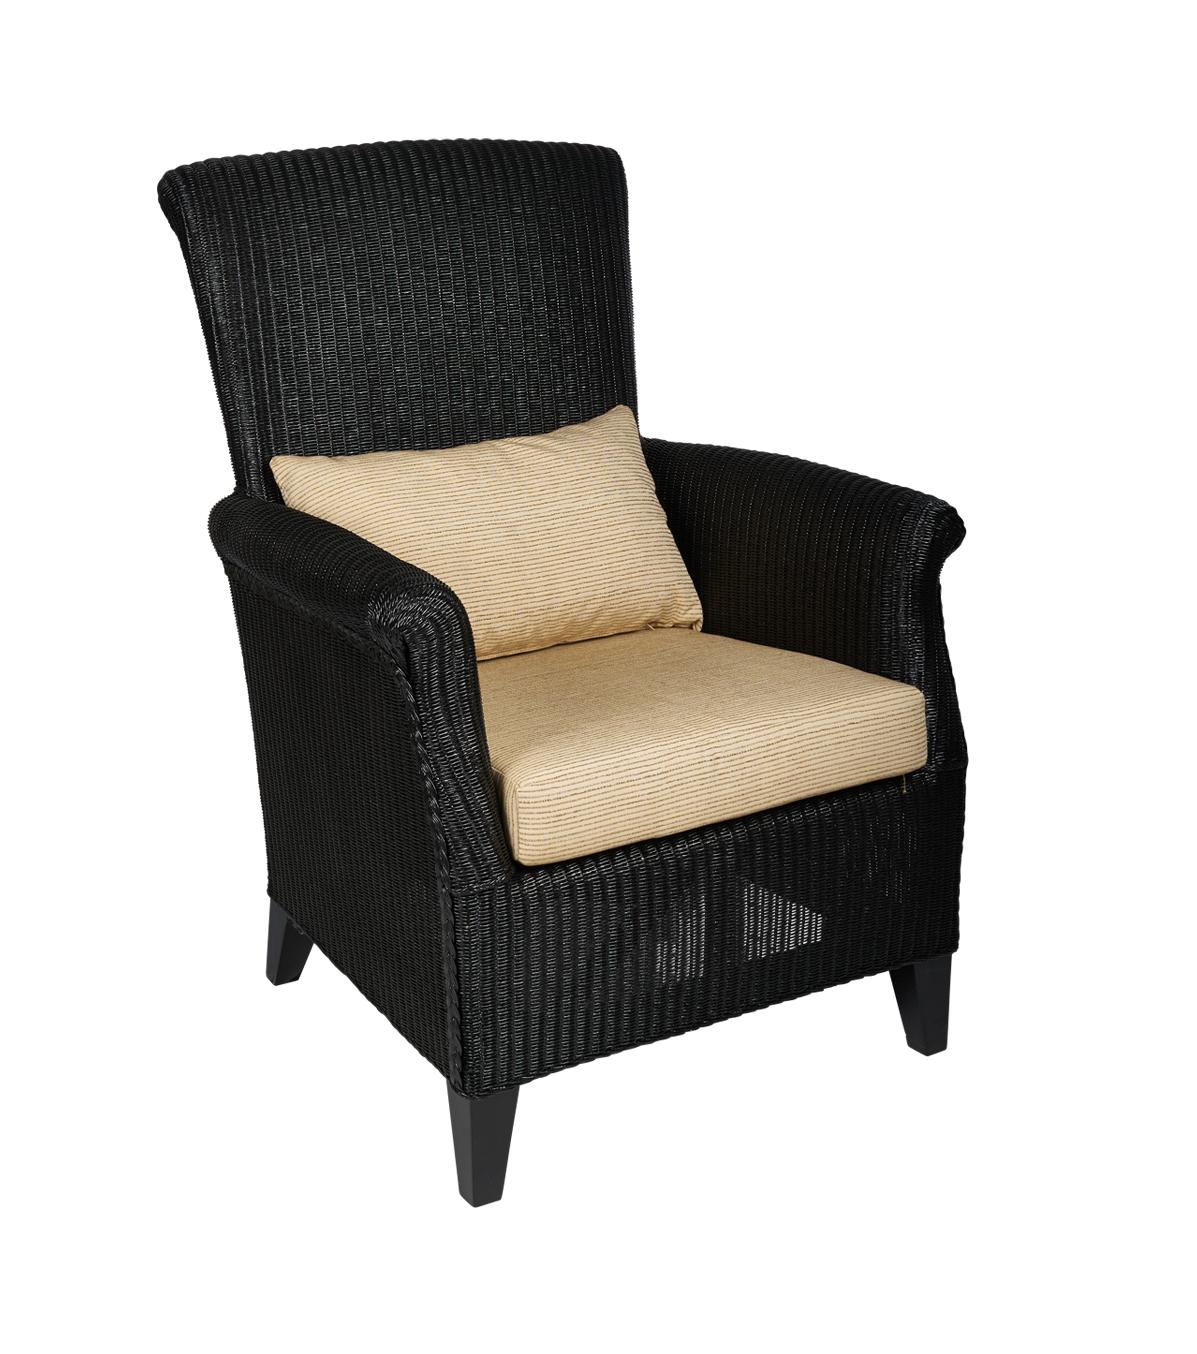 Lloyd loom fauteuil Porto